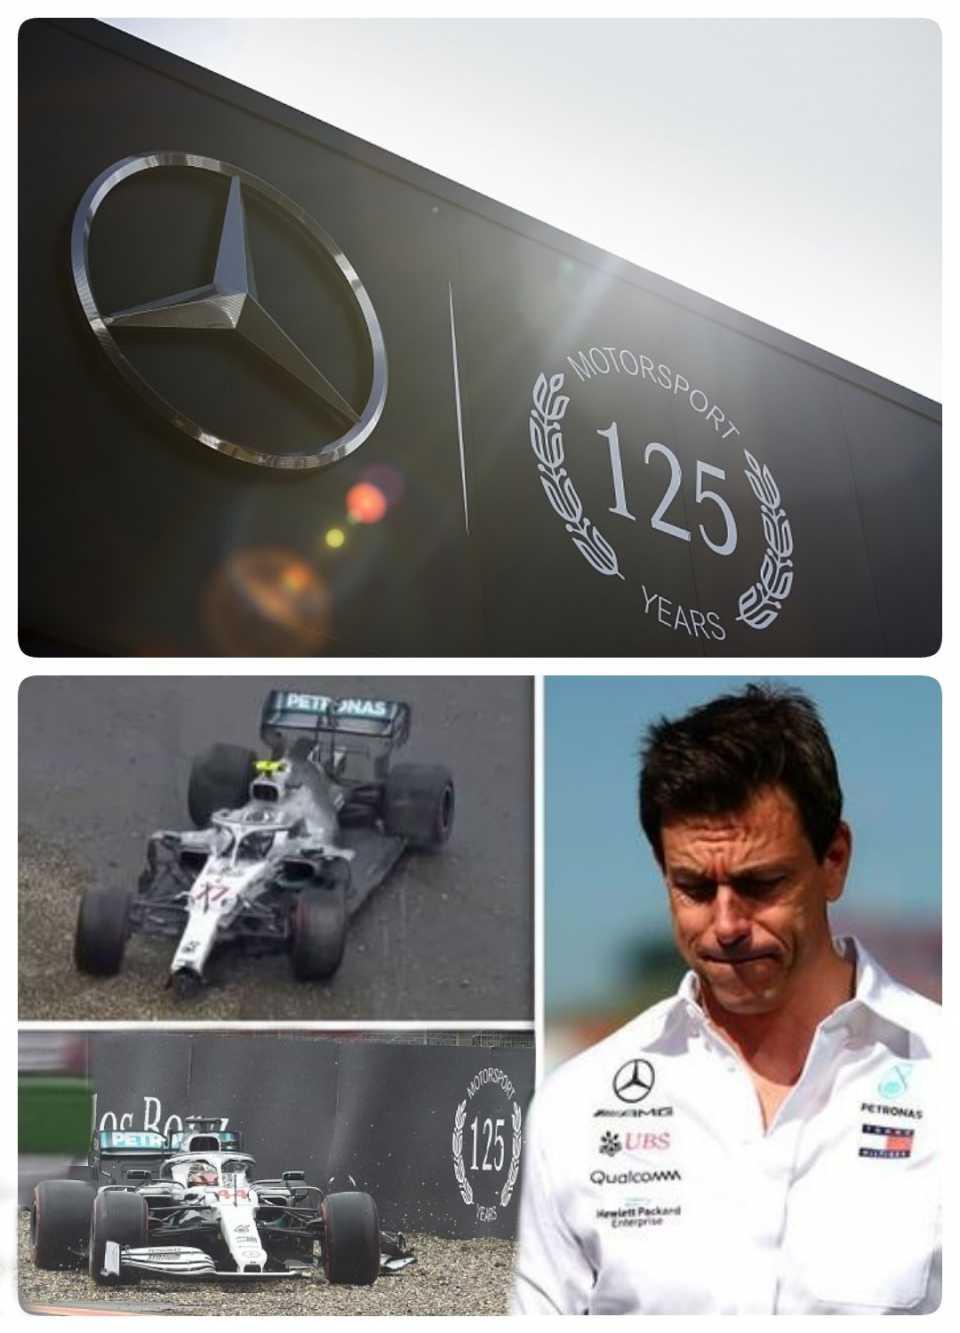 Lewis-Hamilton-Valtteri-Bottas-in-spectacular-German-Grand-Prix-_1564337943659.jpg